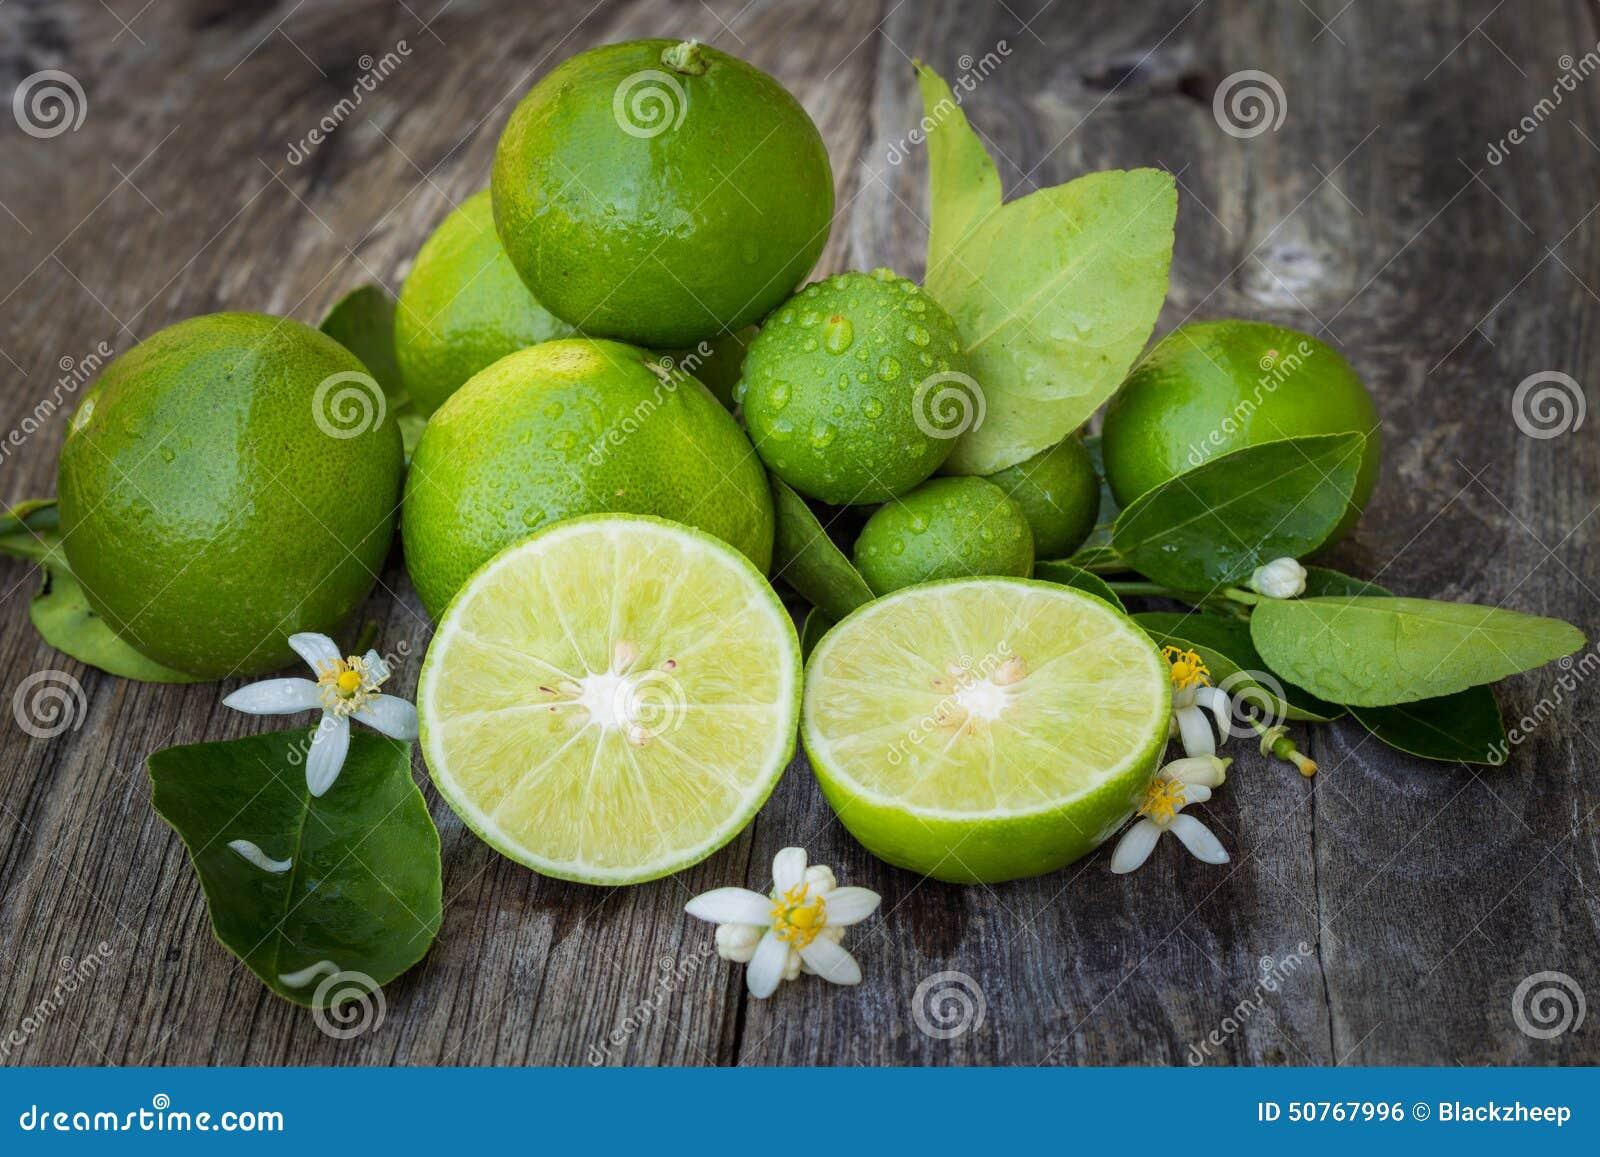 Green lime lemon on wood